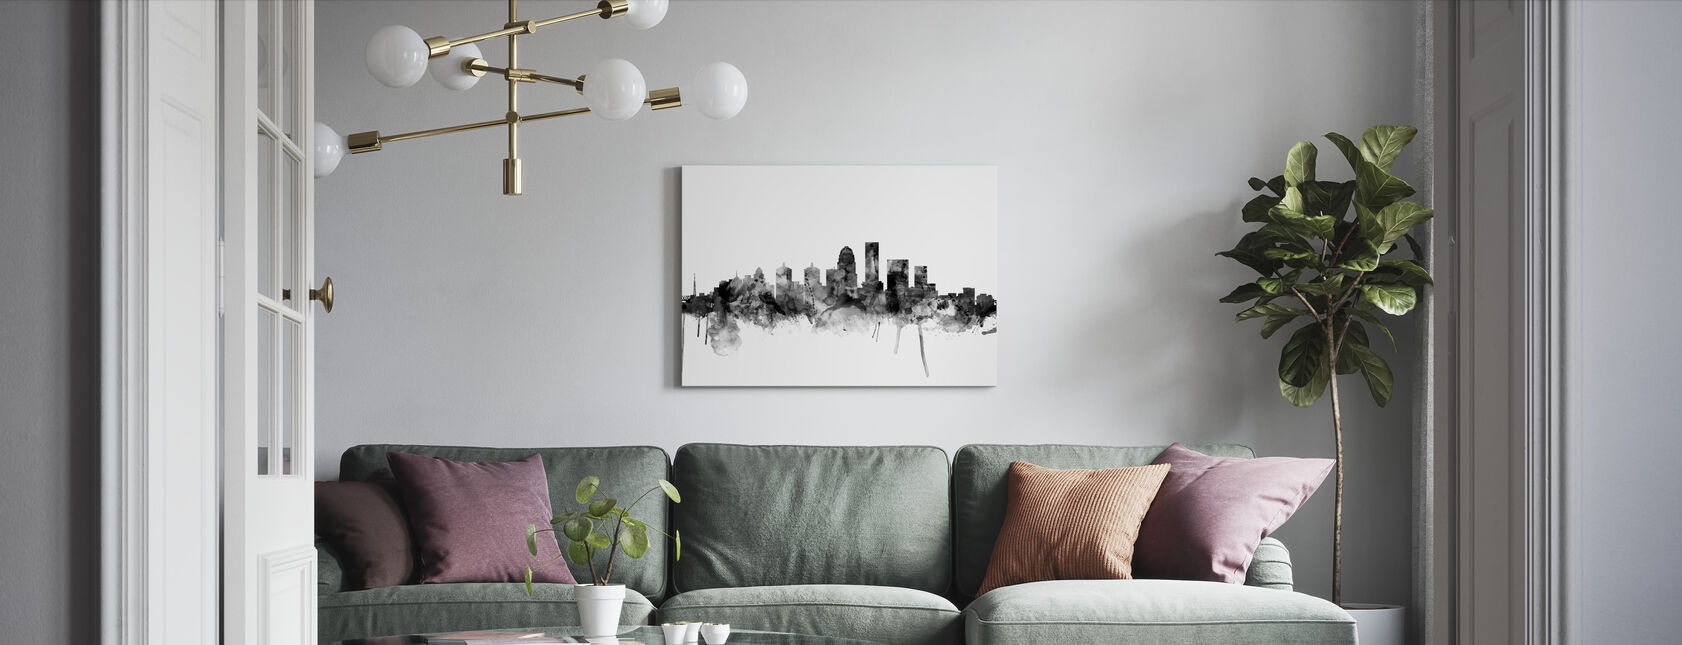 Louisville Kentucky Skyline Black - Canvas print - Living Room